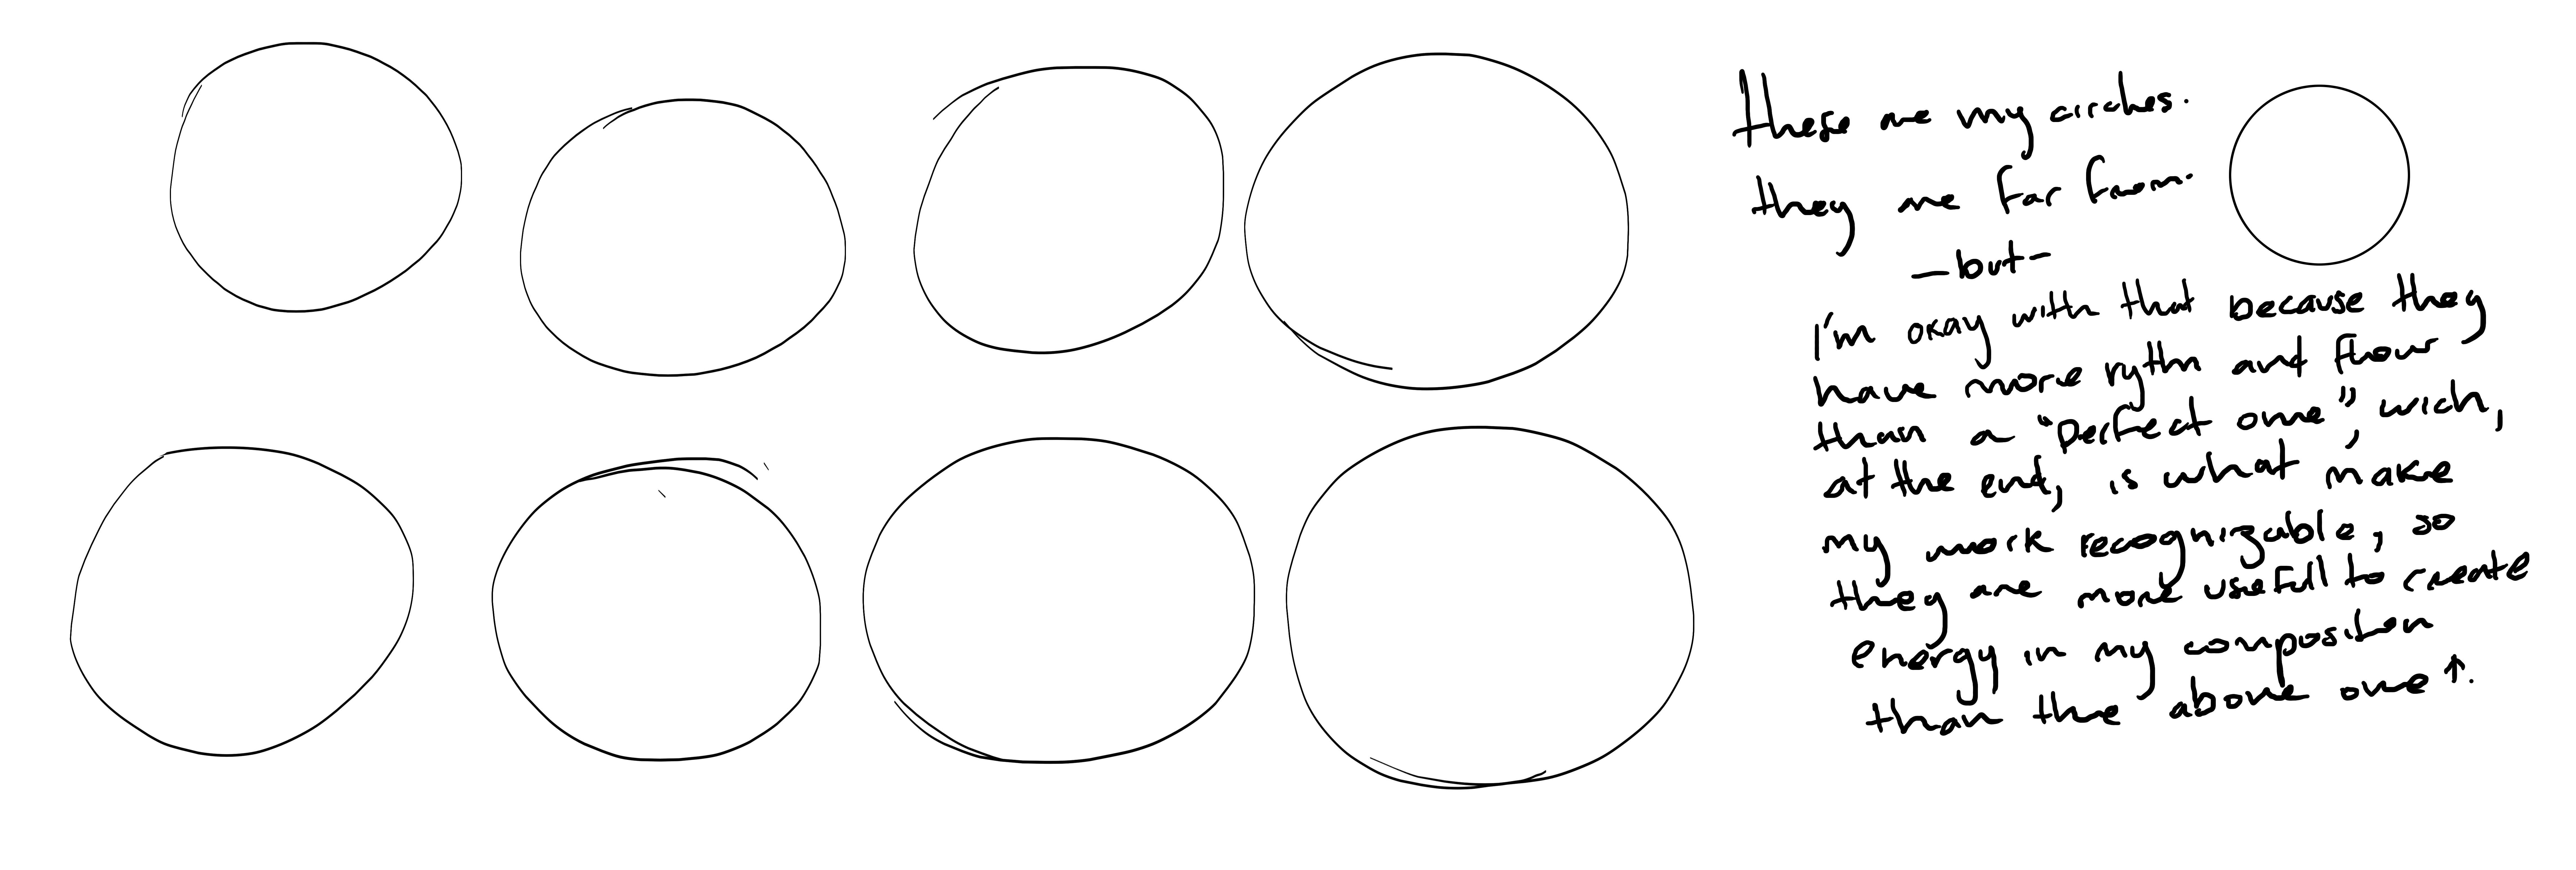 Tips On Drawing A Circle